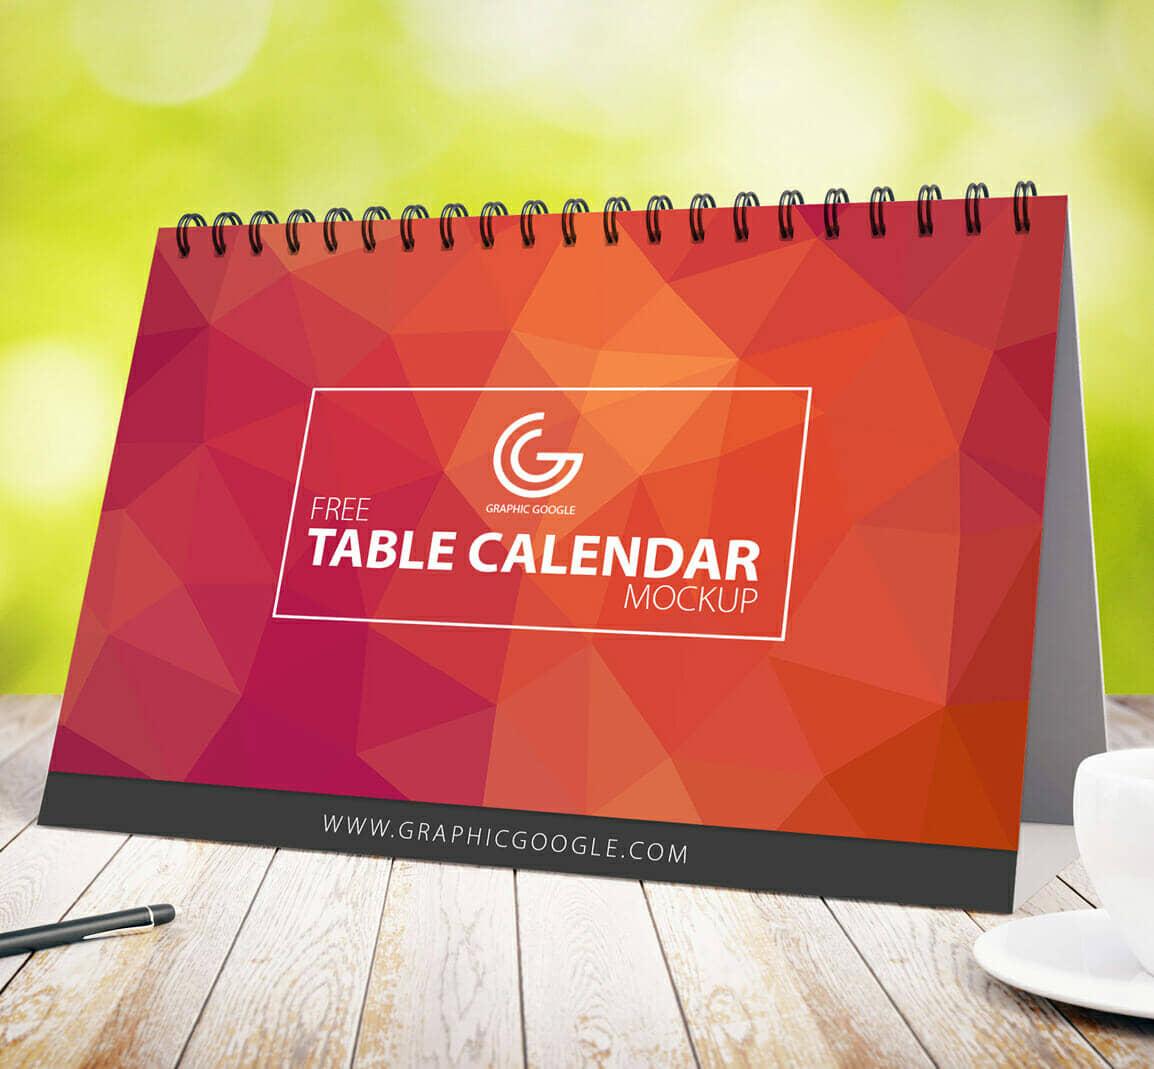 Free Table Calendar Mockup For 2017